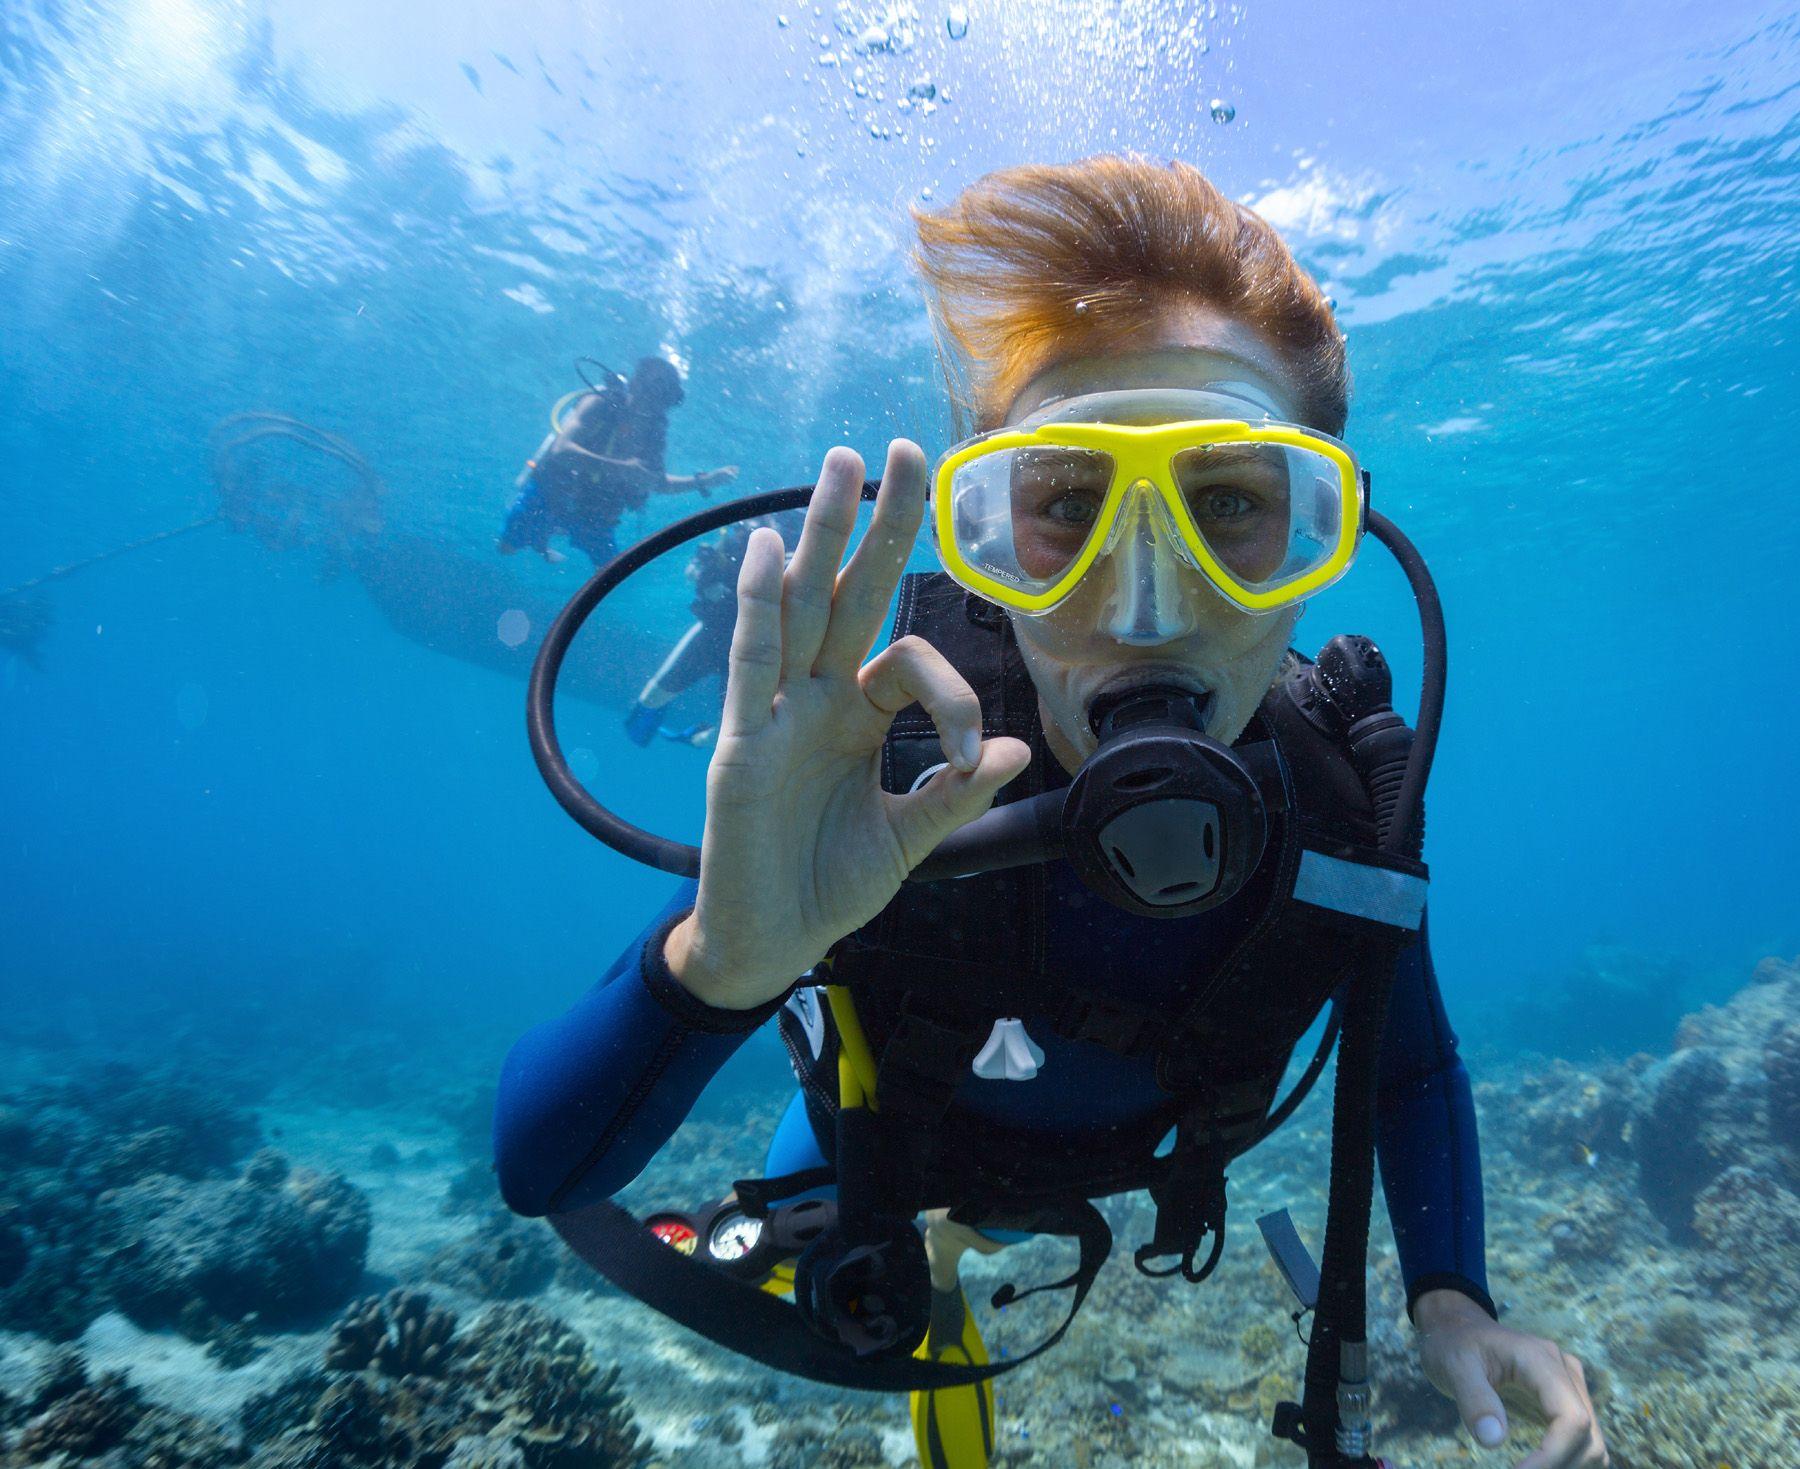 Gestures in the water scuba diver 51891 Scuba diving